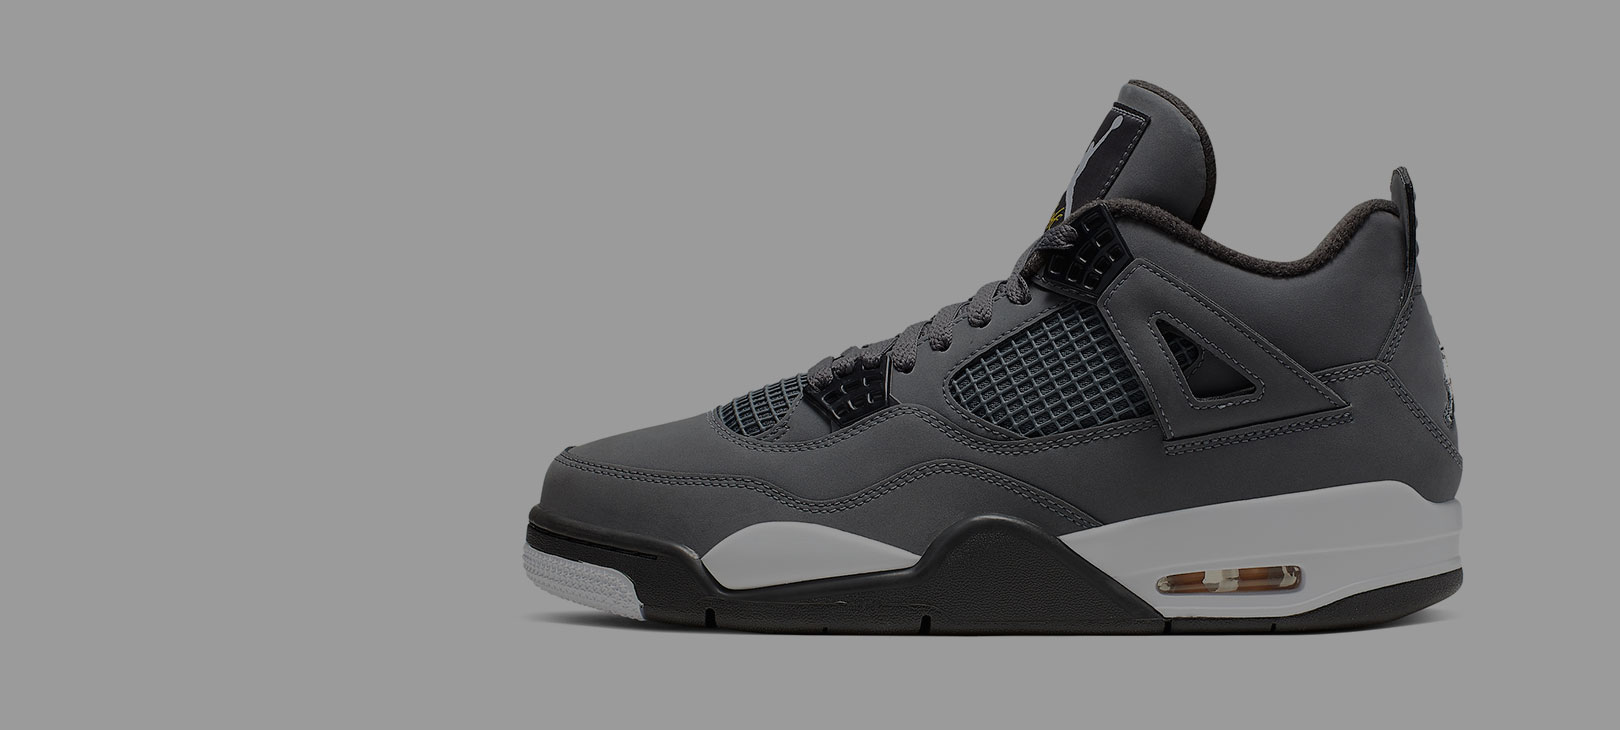 906152a0 Sneaker News - Jordans, release dates & more.